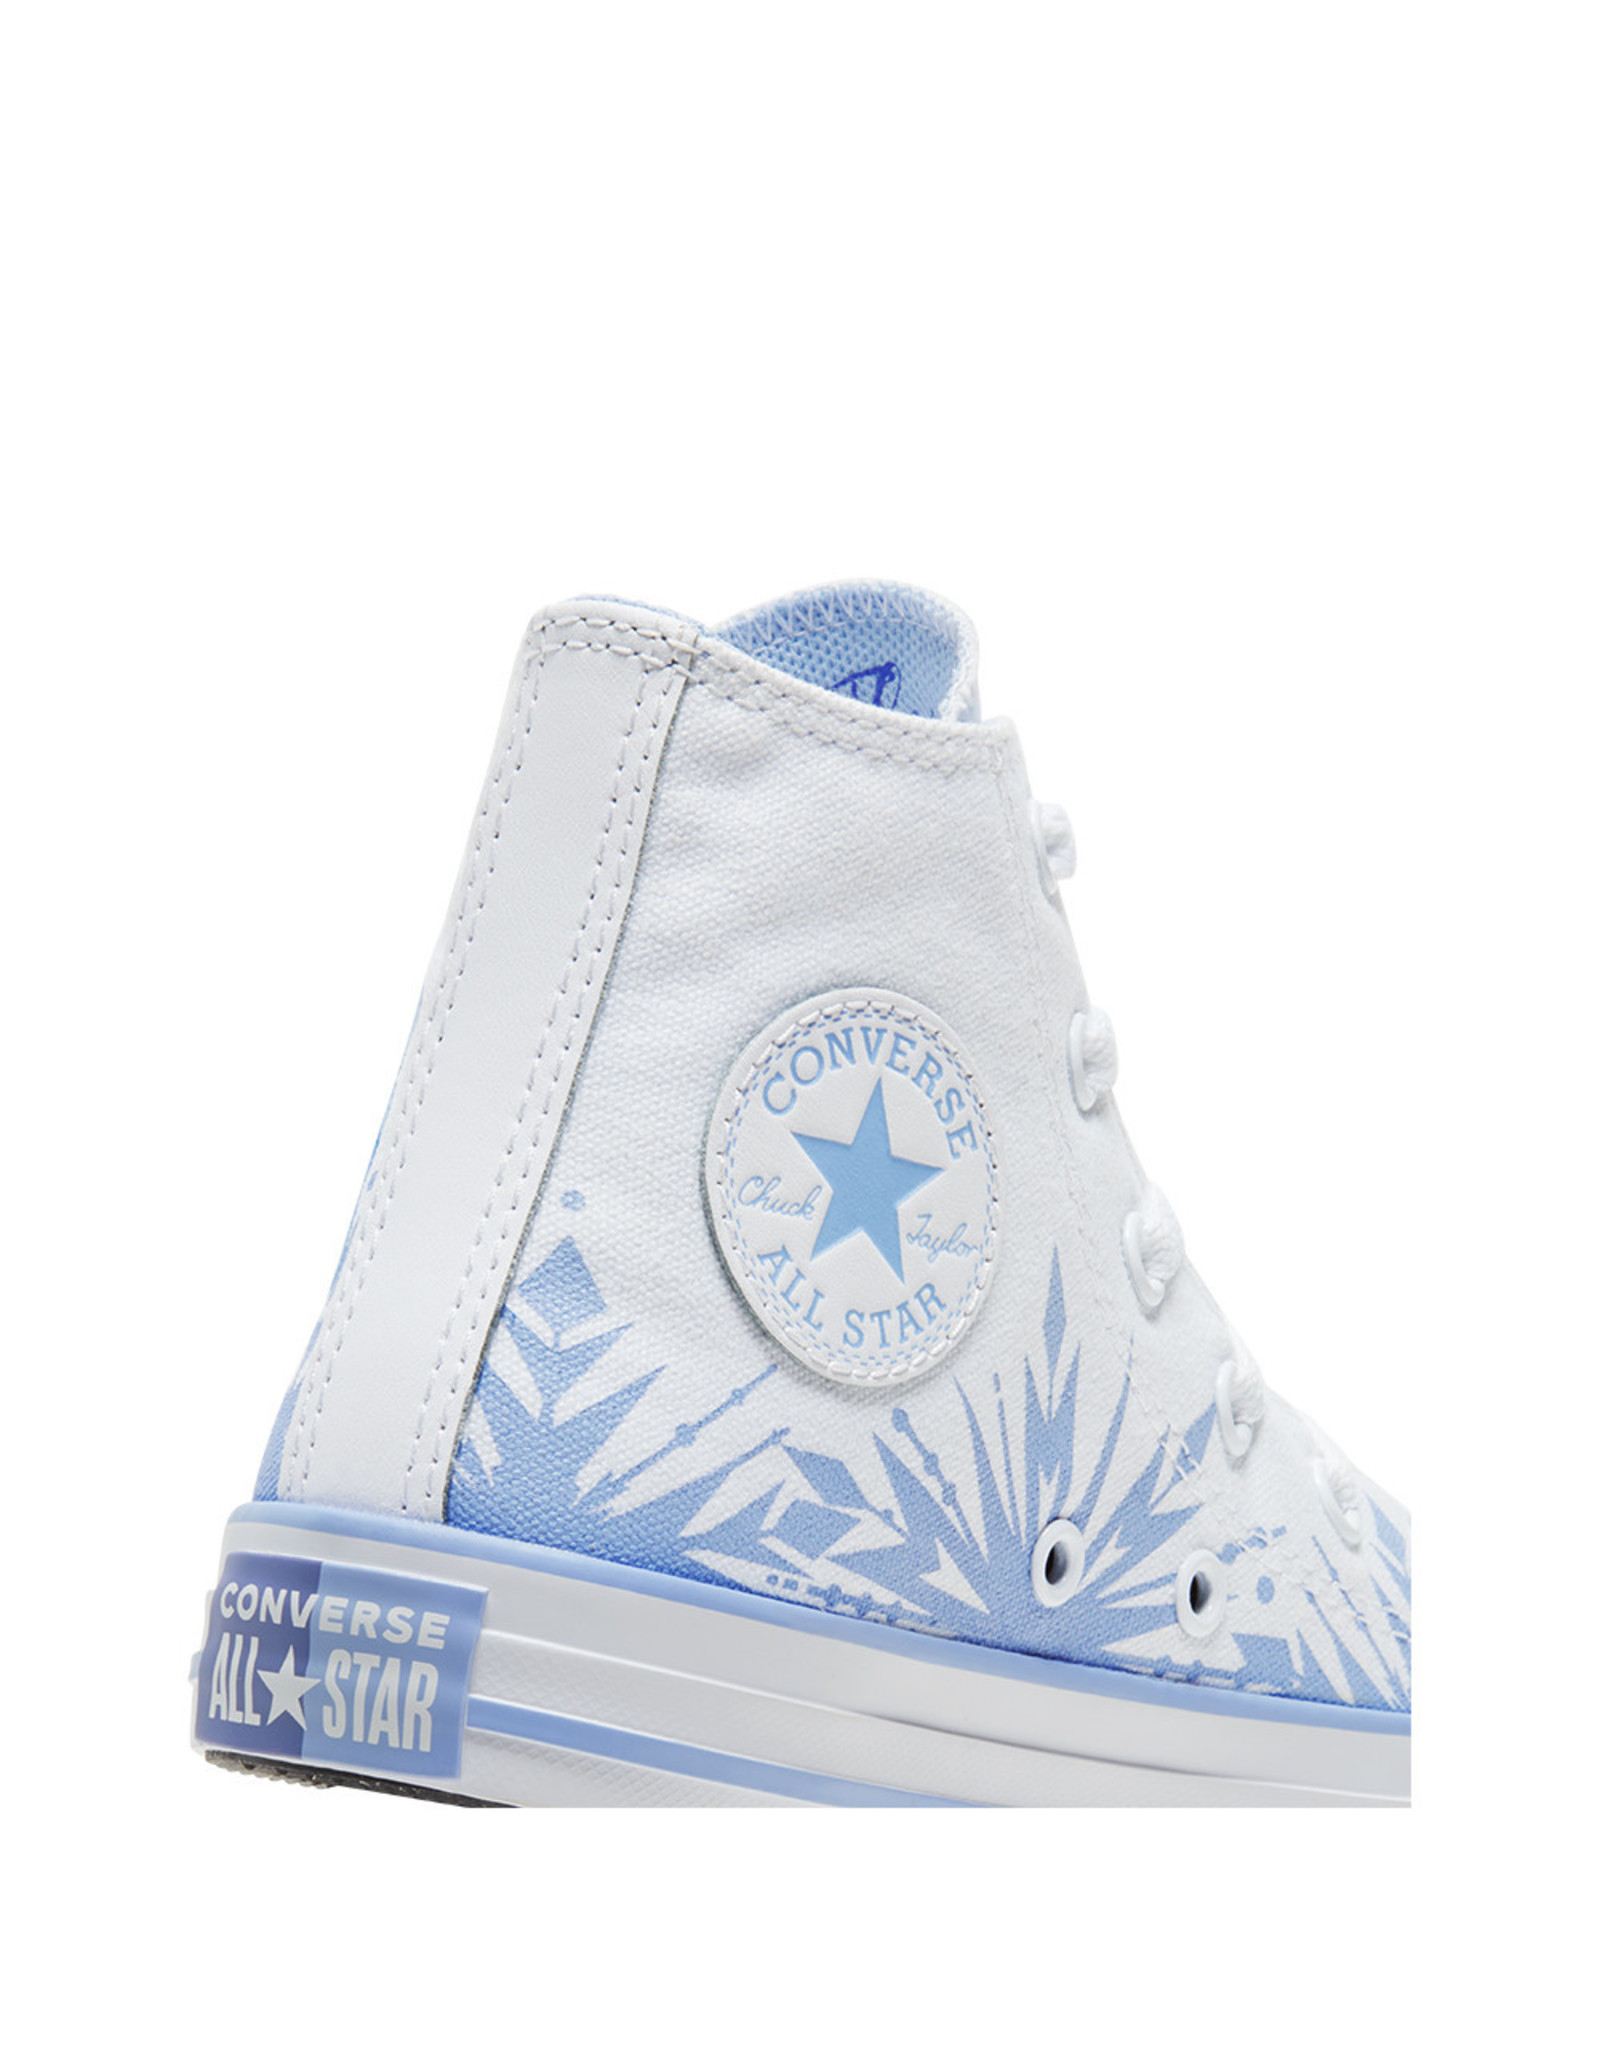 CONVERSE CHUCK TAYLOR ALL STAR HI FROZEN 2 WHITE/BLUE HERON/WHITE CZFZH-667354C